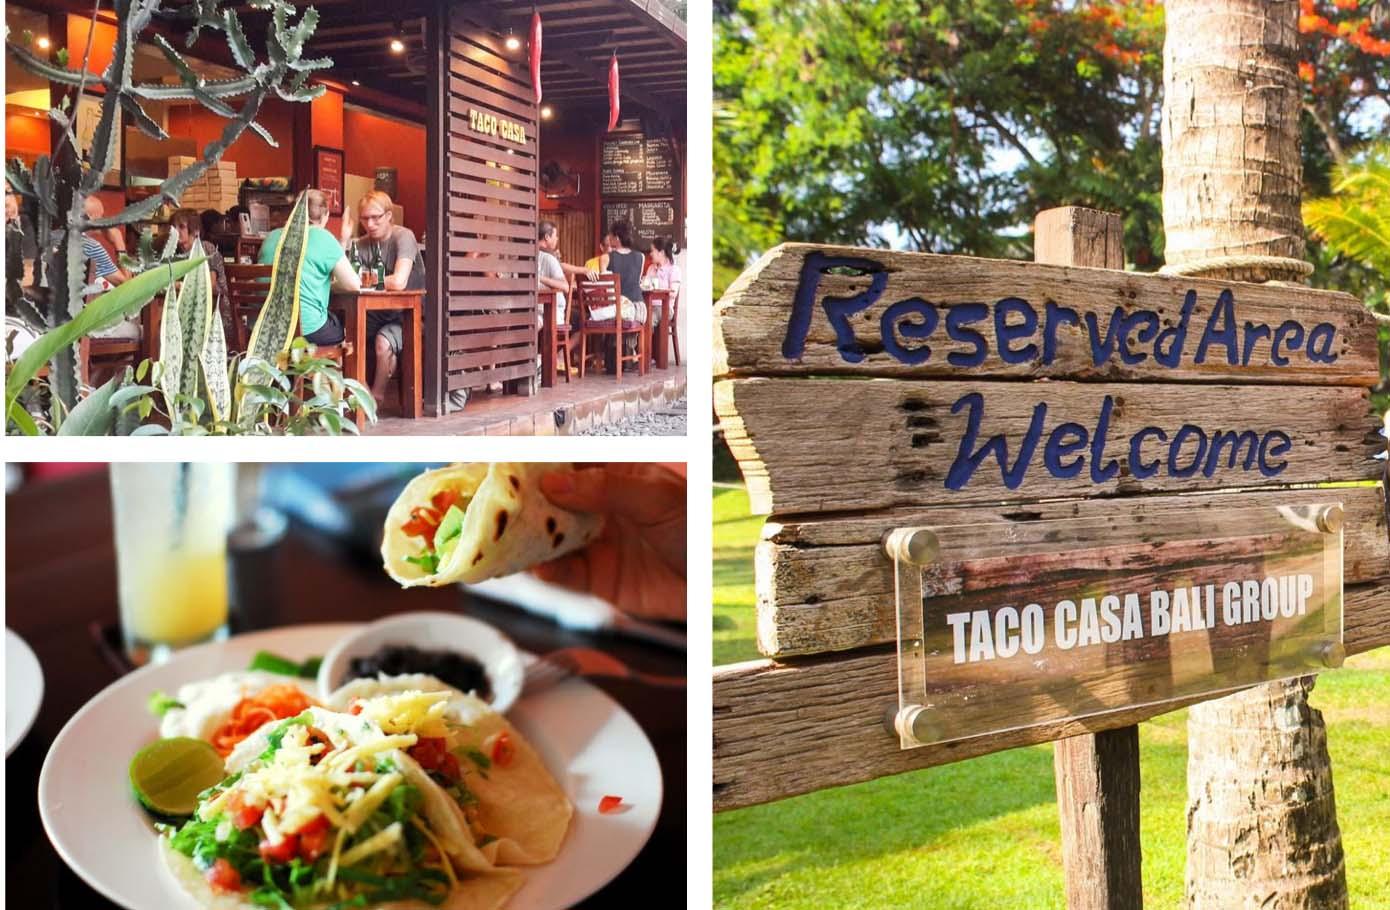 Taco-Casa-Bali